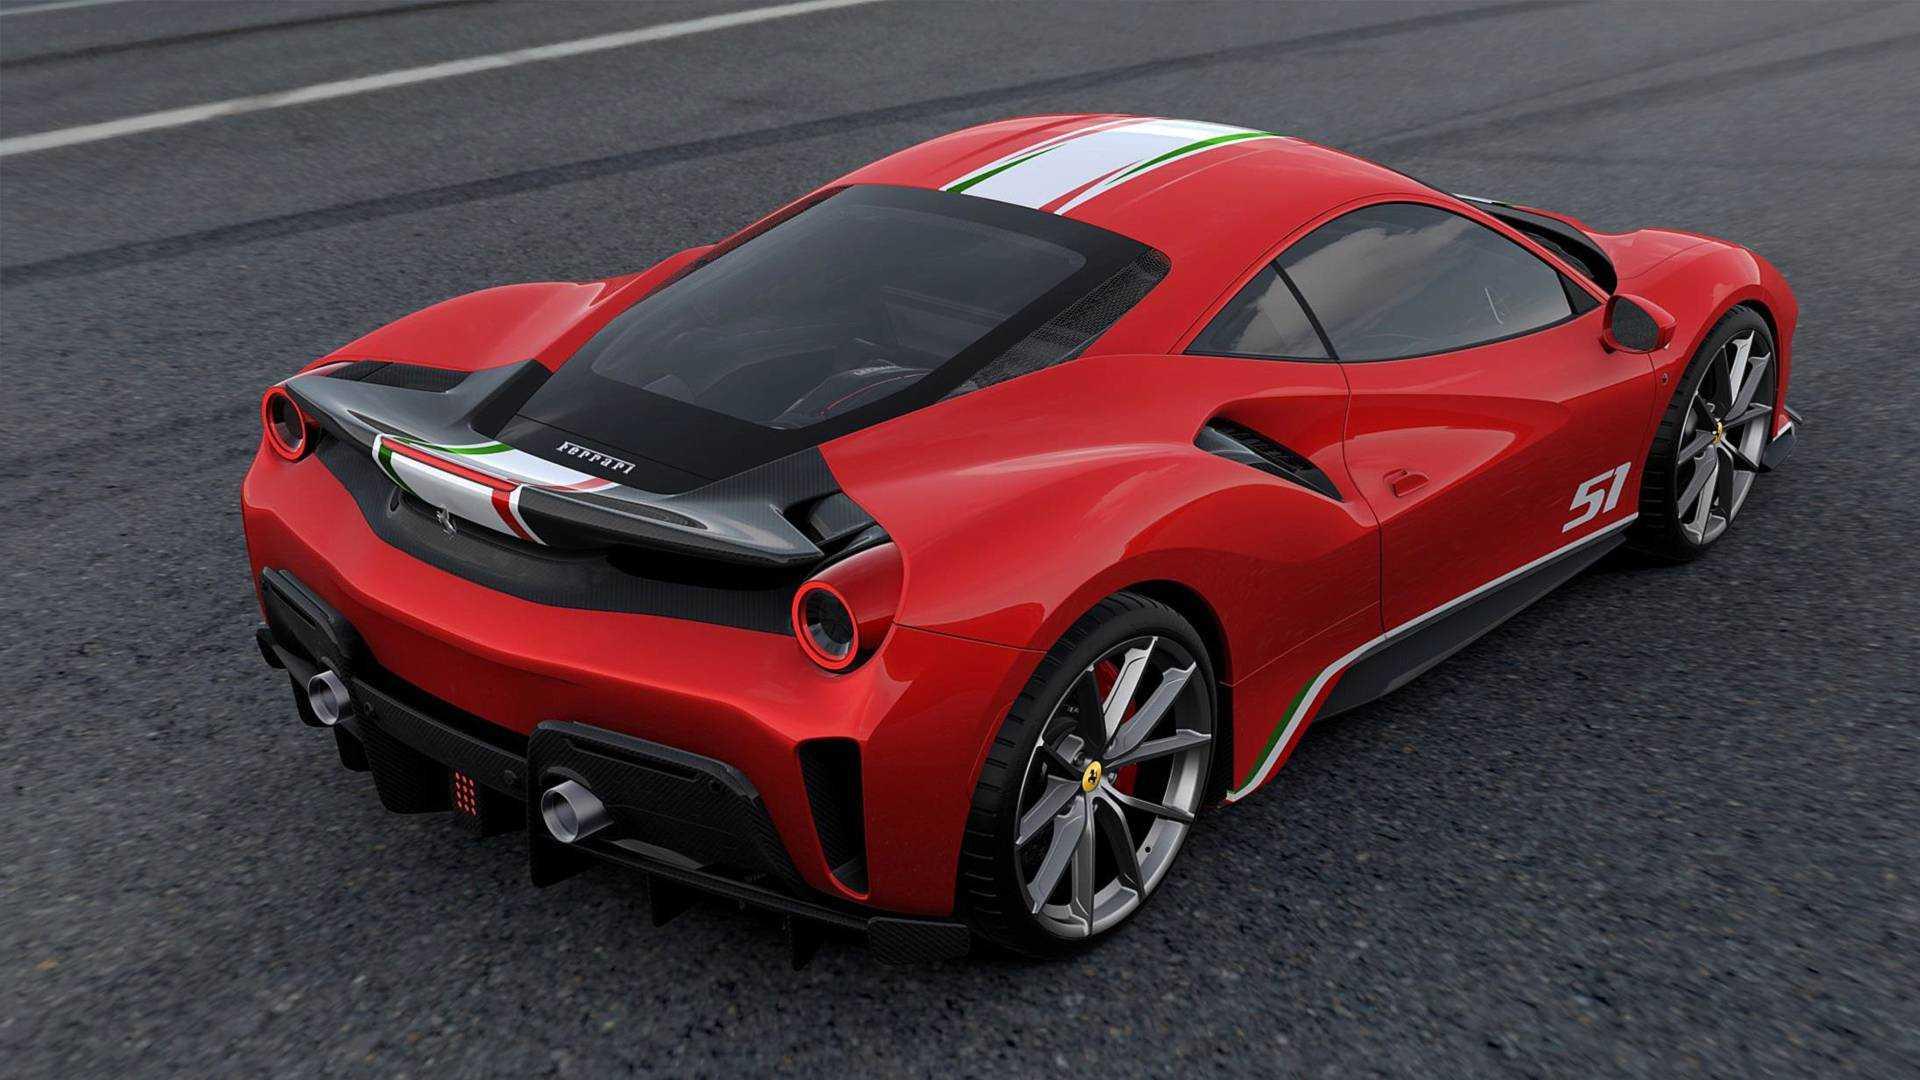 Ferrari 488 Pista Piloti Ferrari 2018 Sondermodell In Vier Farben